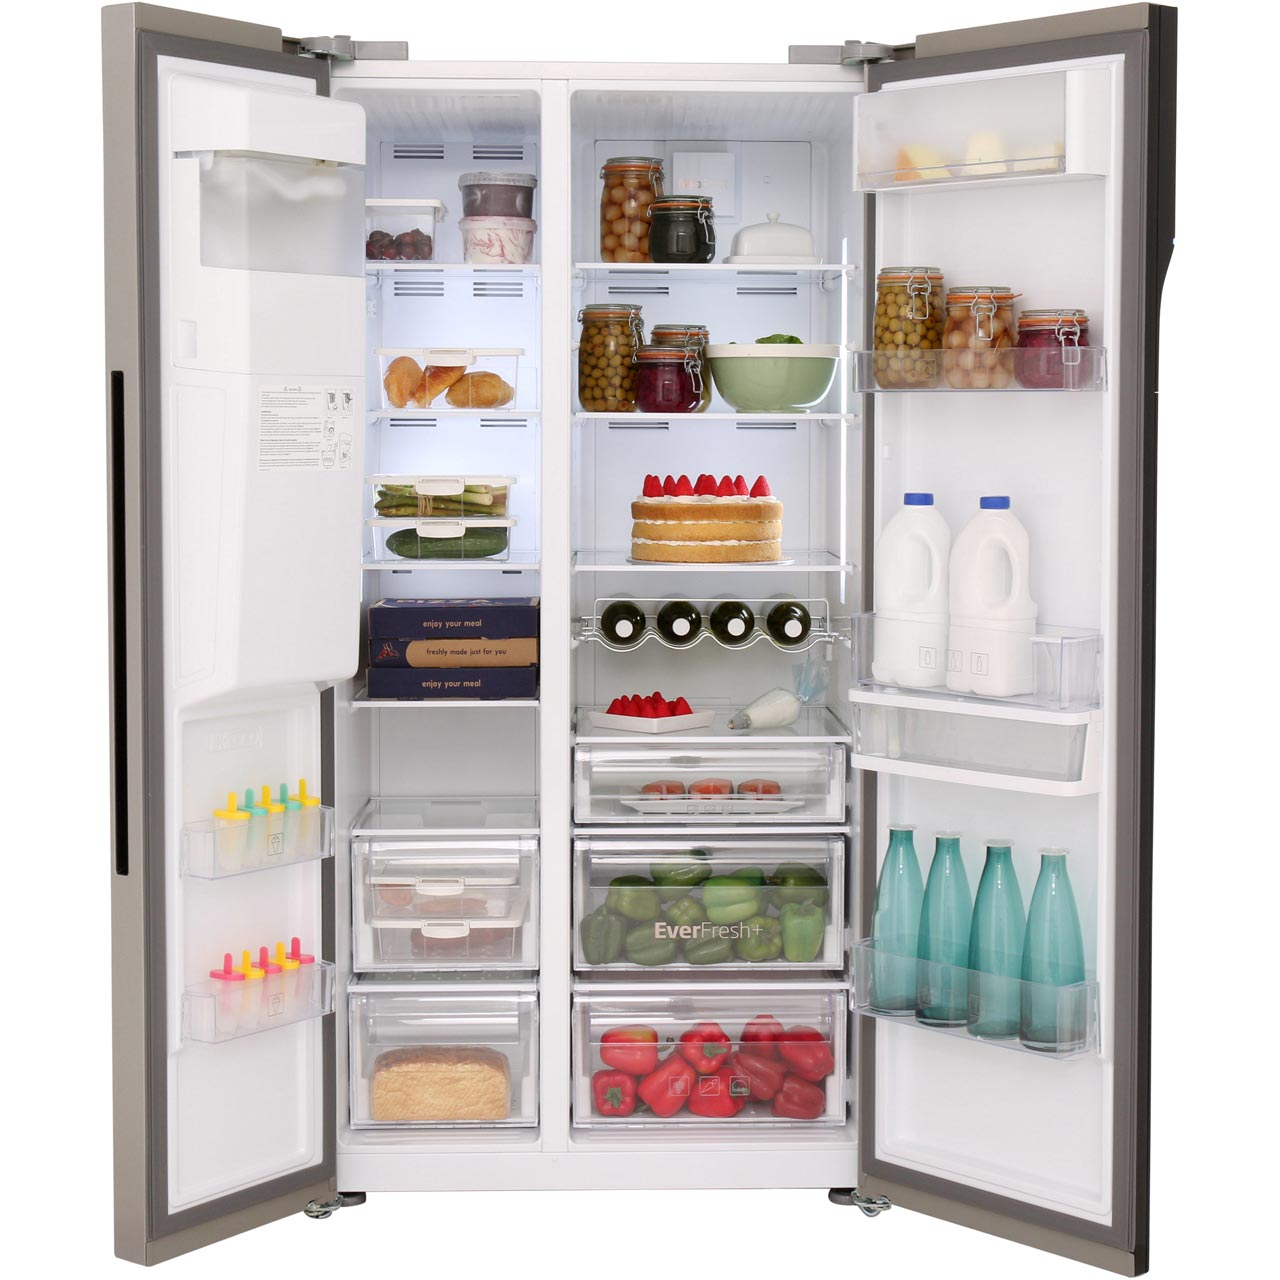 American Kitchen Appliances Product ~ Boots kitchen appliances washing machines fridges more